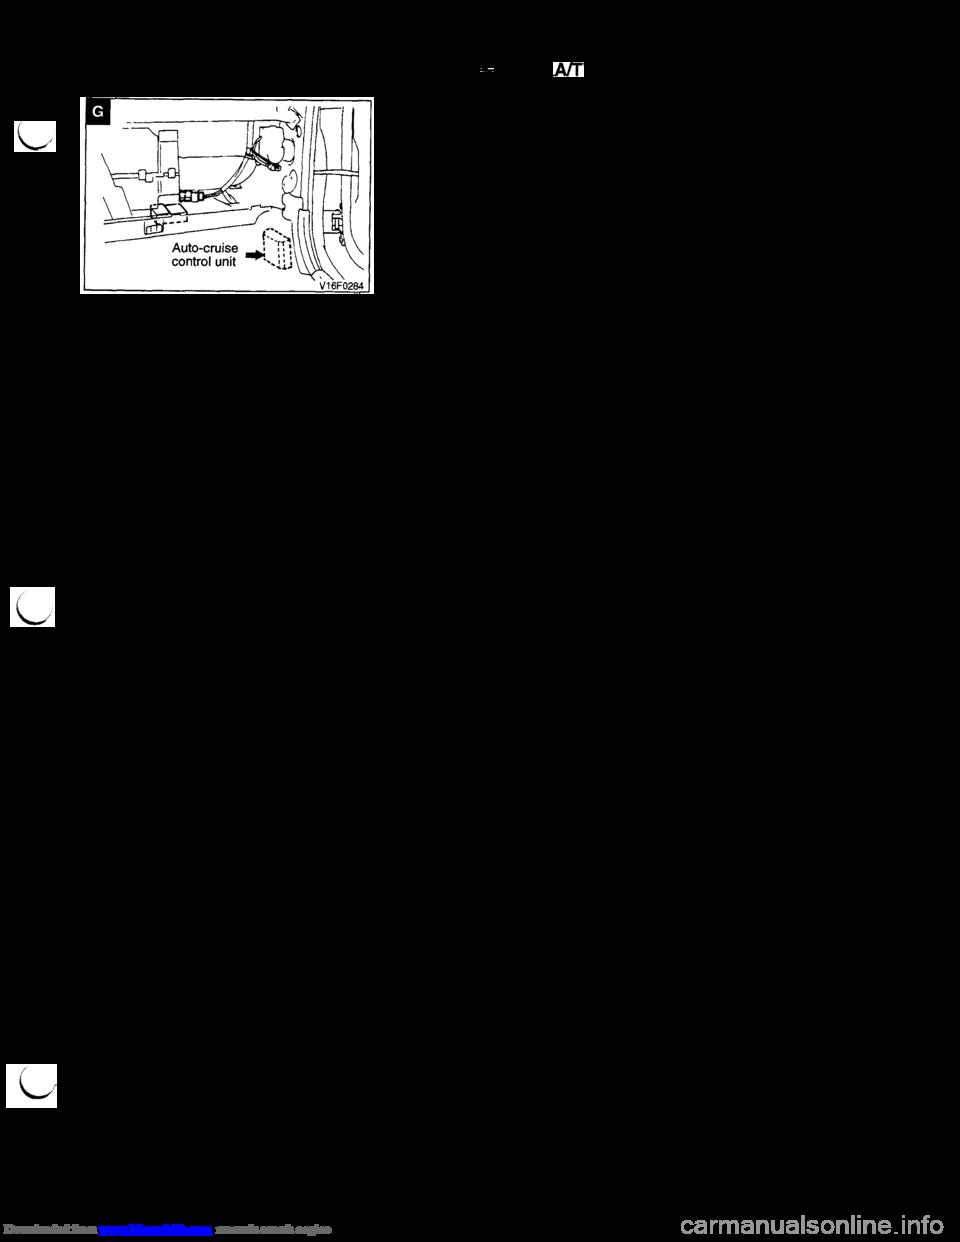 Mitsubishi 3000gt 1994 2g Workshop Manual Engine Diagram